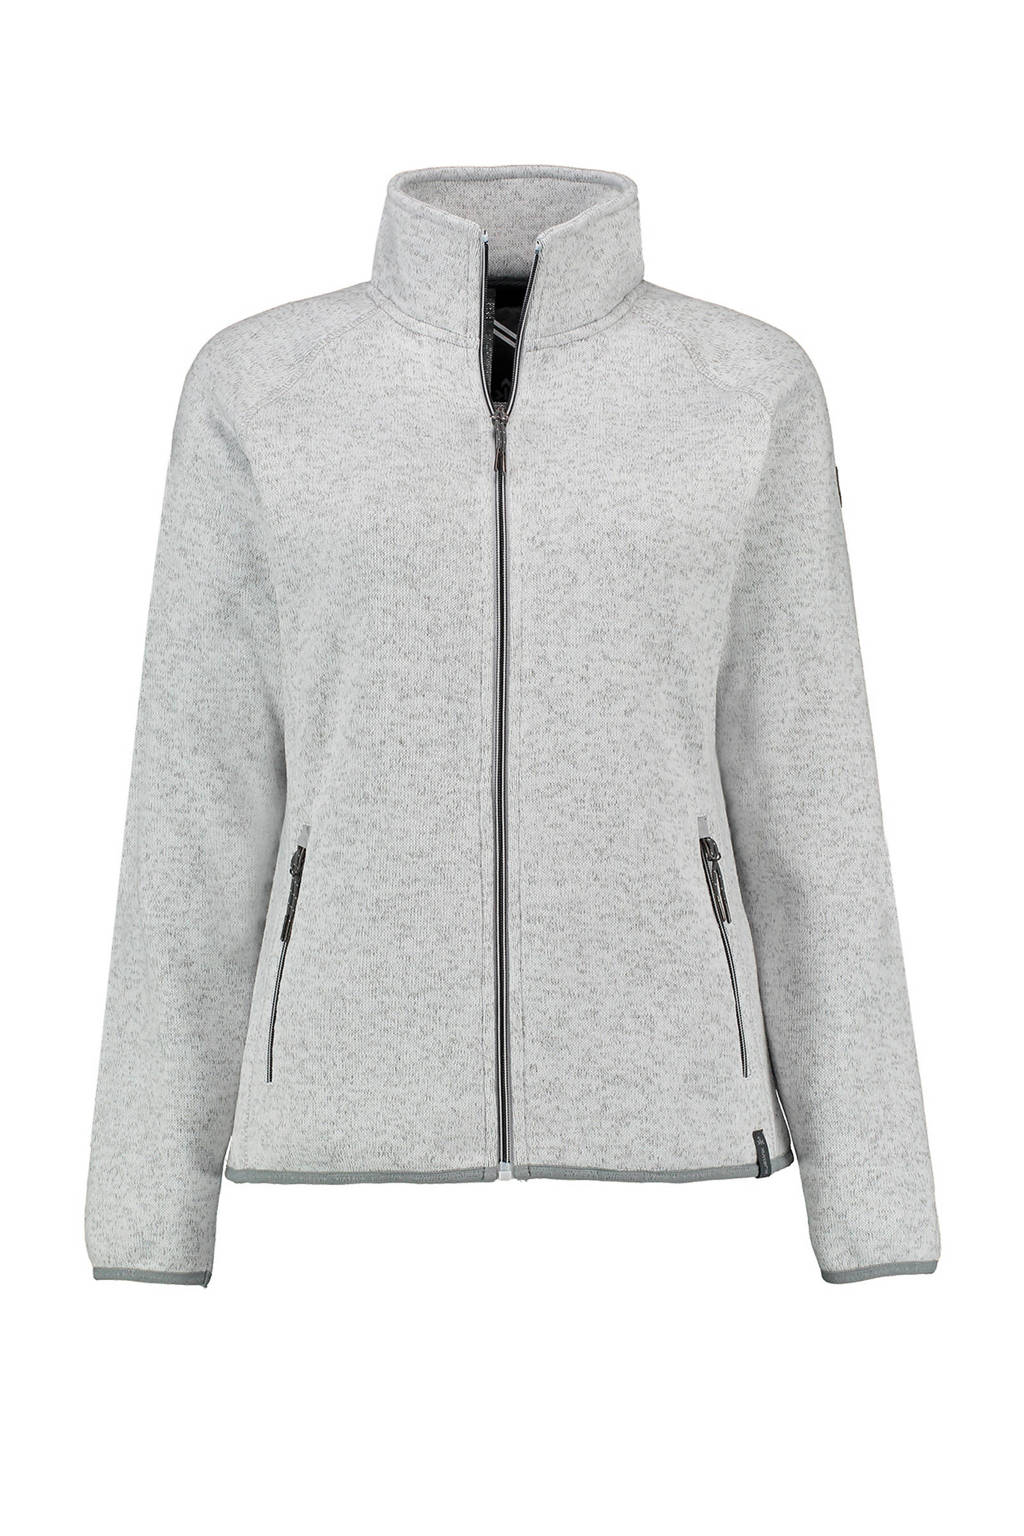 Kjelvik fleece jack Byanca wit/grijs, Wit/grijs